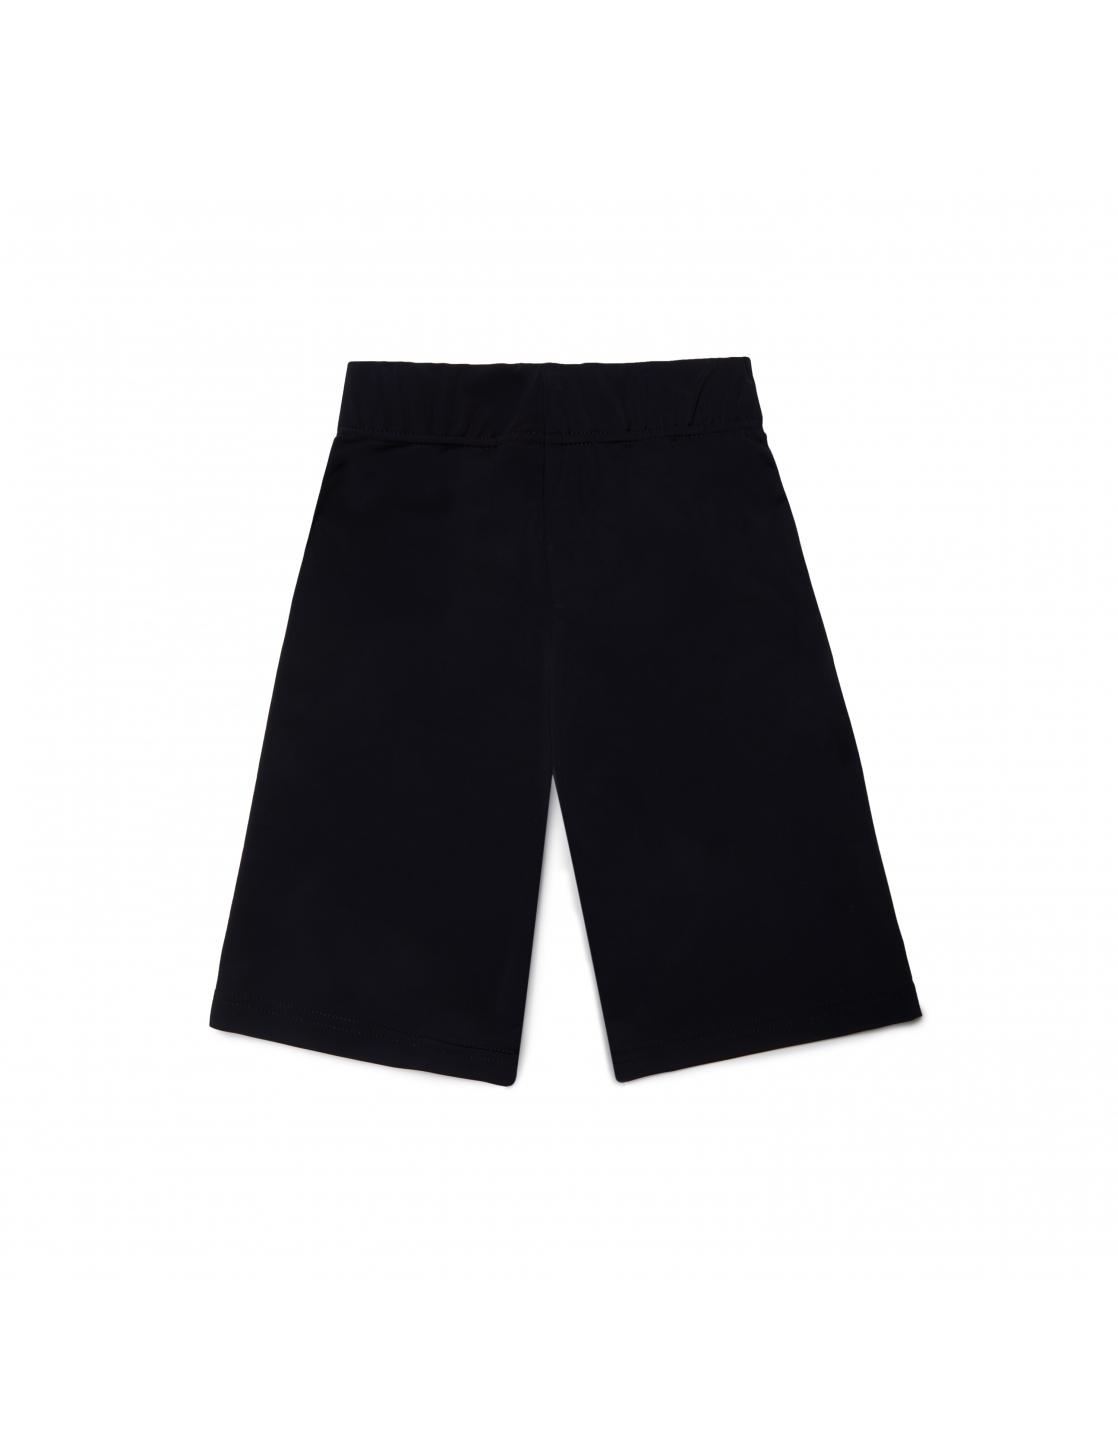 ZNY PVC LOGO Womens Shorts